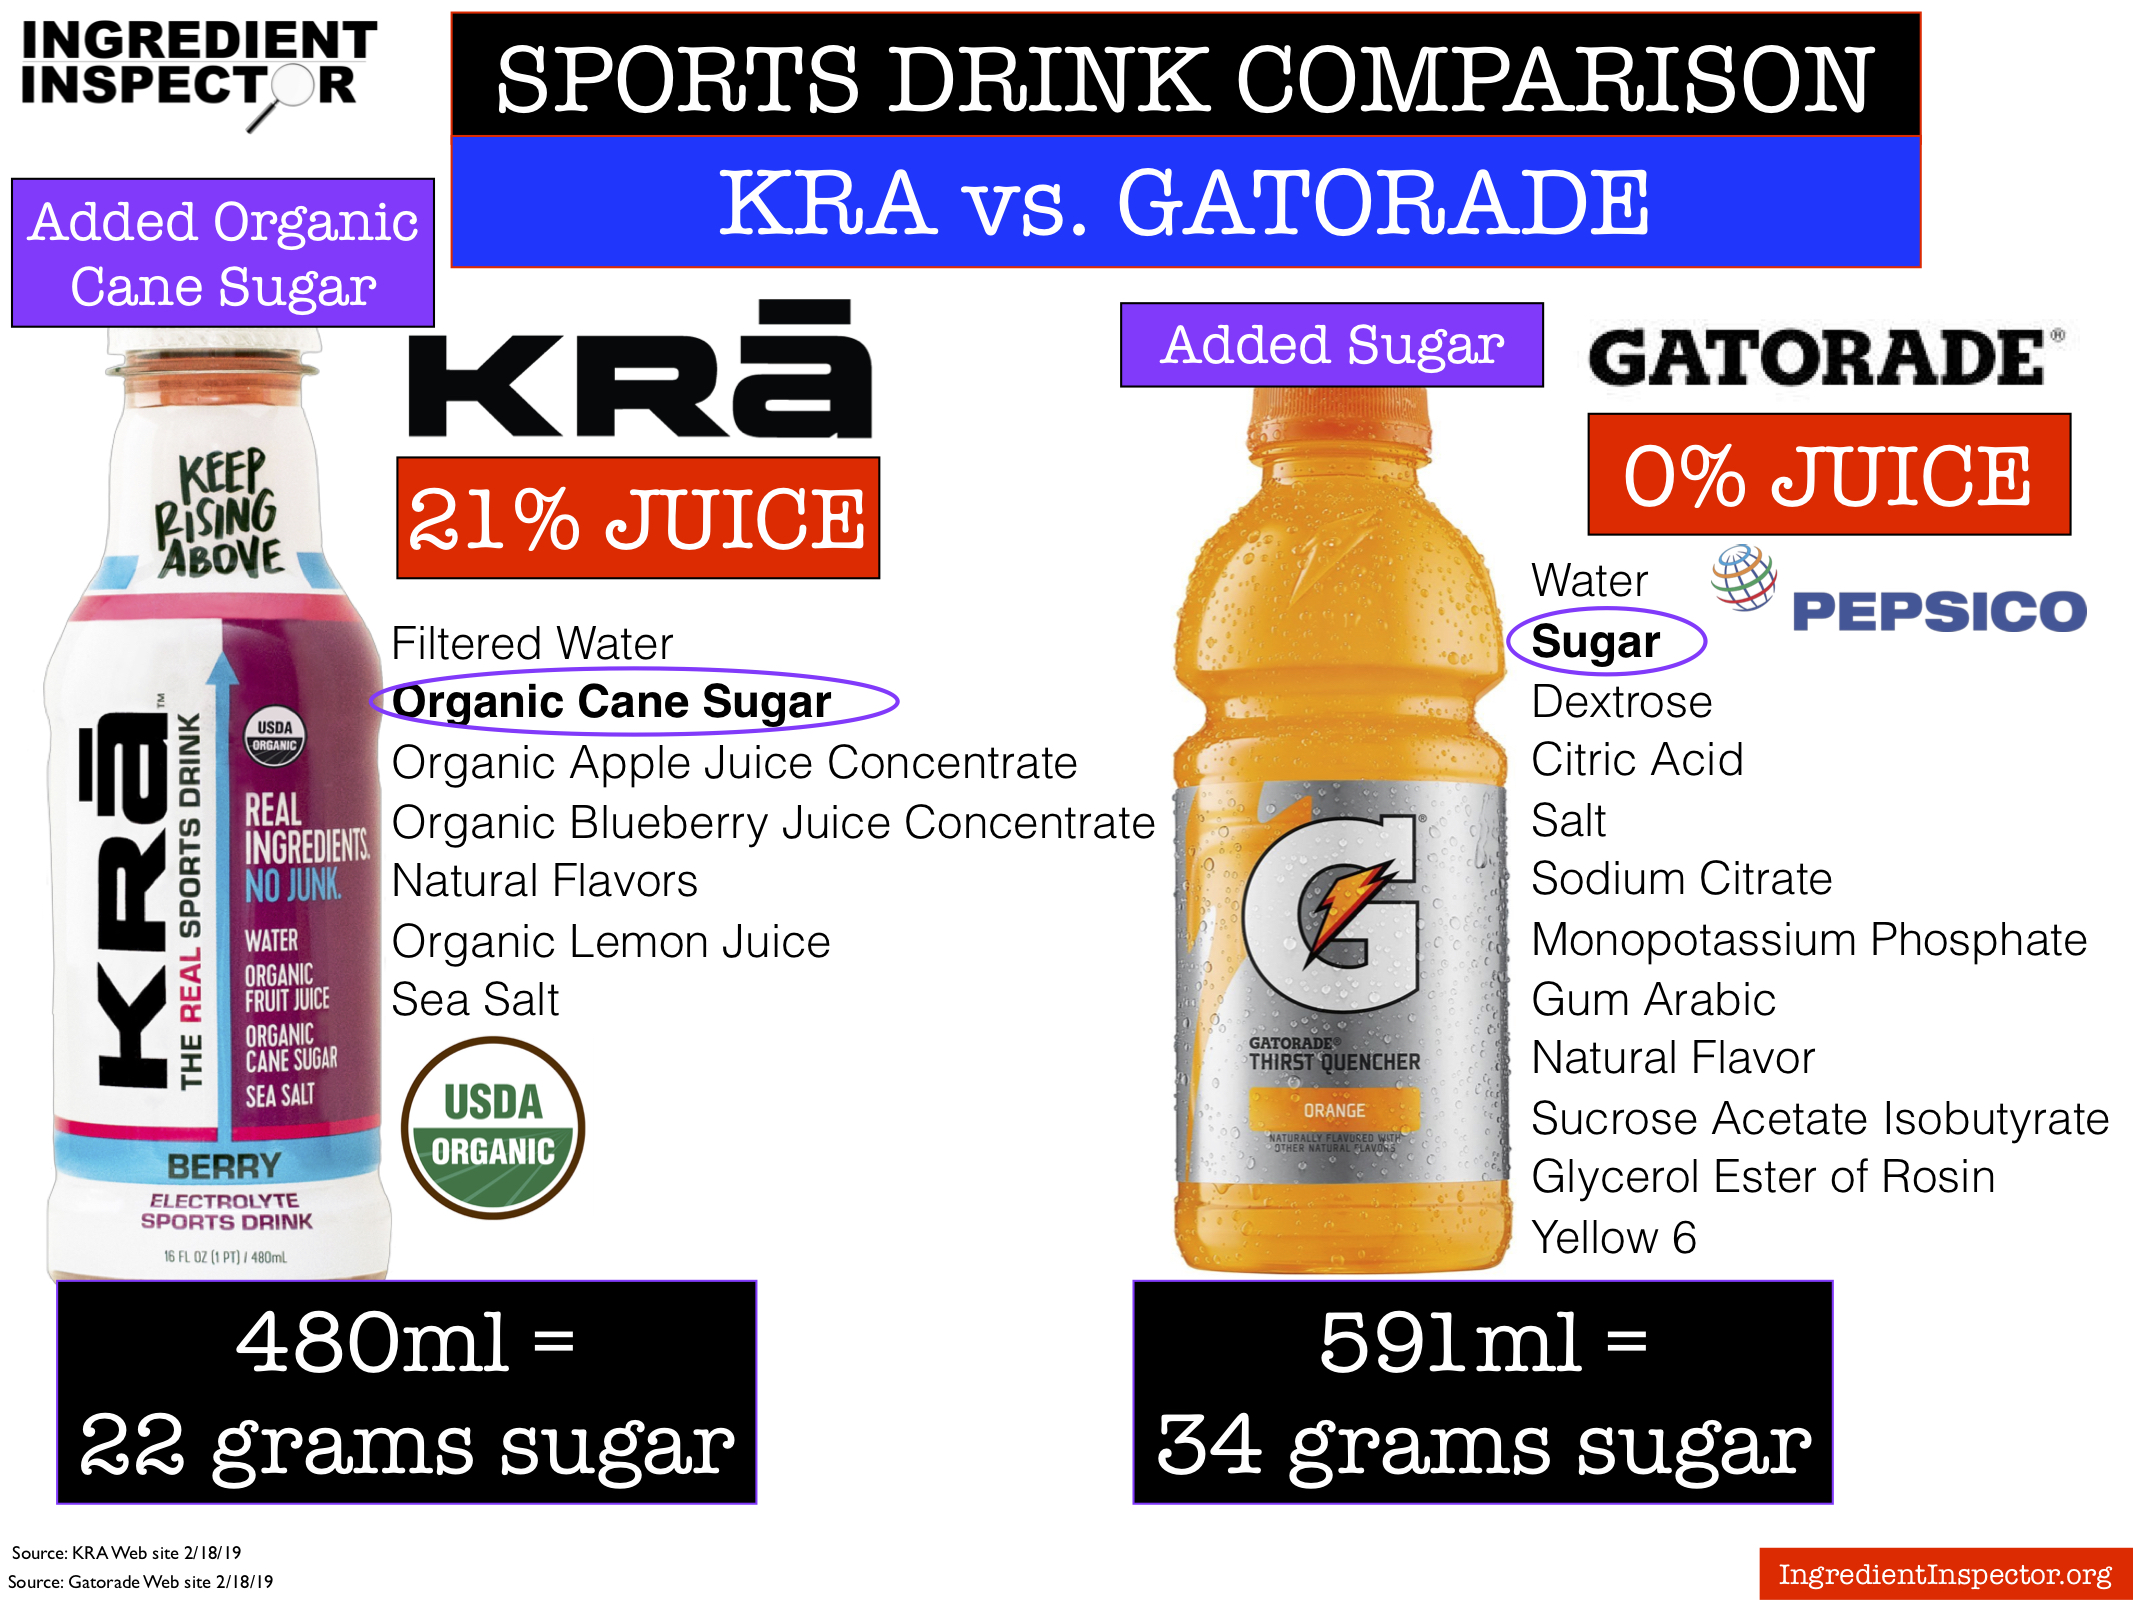 Ingredient Inspector Sports Drink Comparison KRA vs. Gatorade.jpg